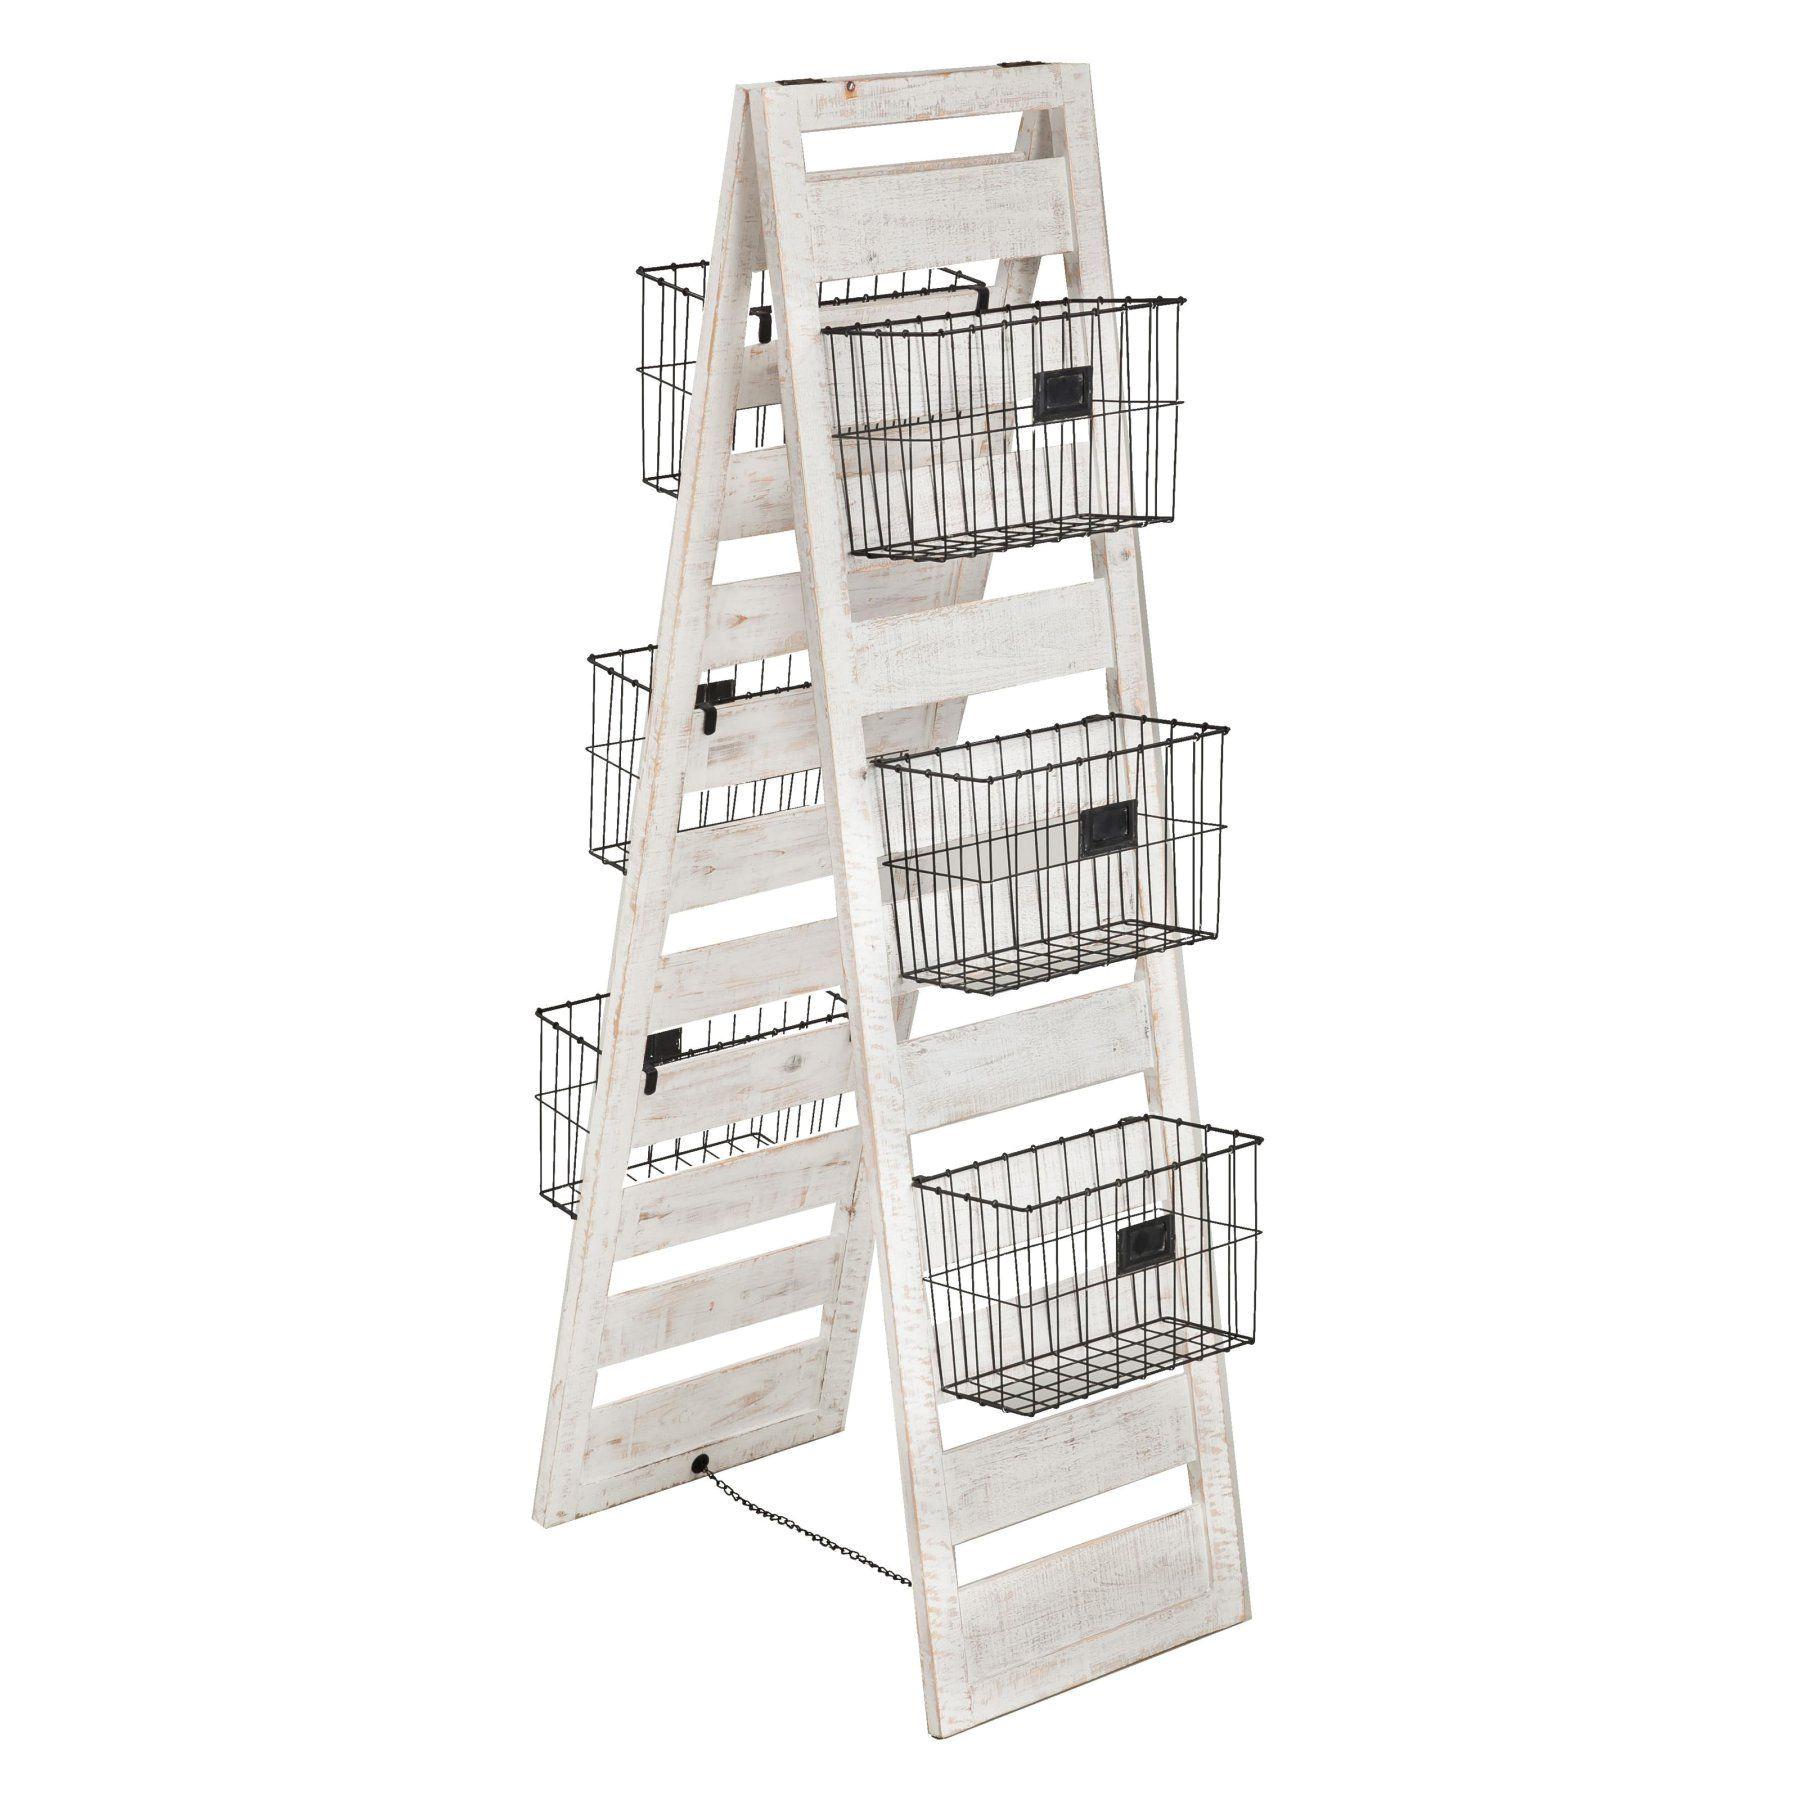 evergreen enterprises double sided wooden ladder storage rack 8f00156